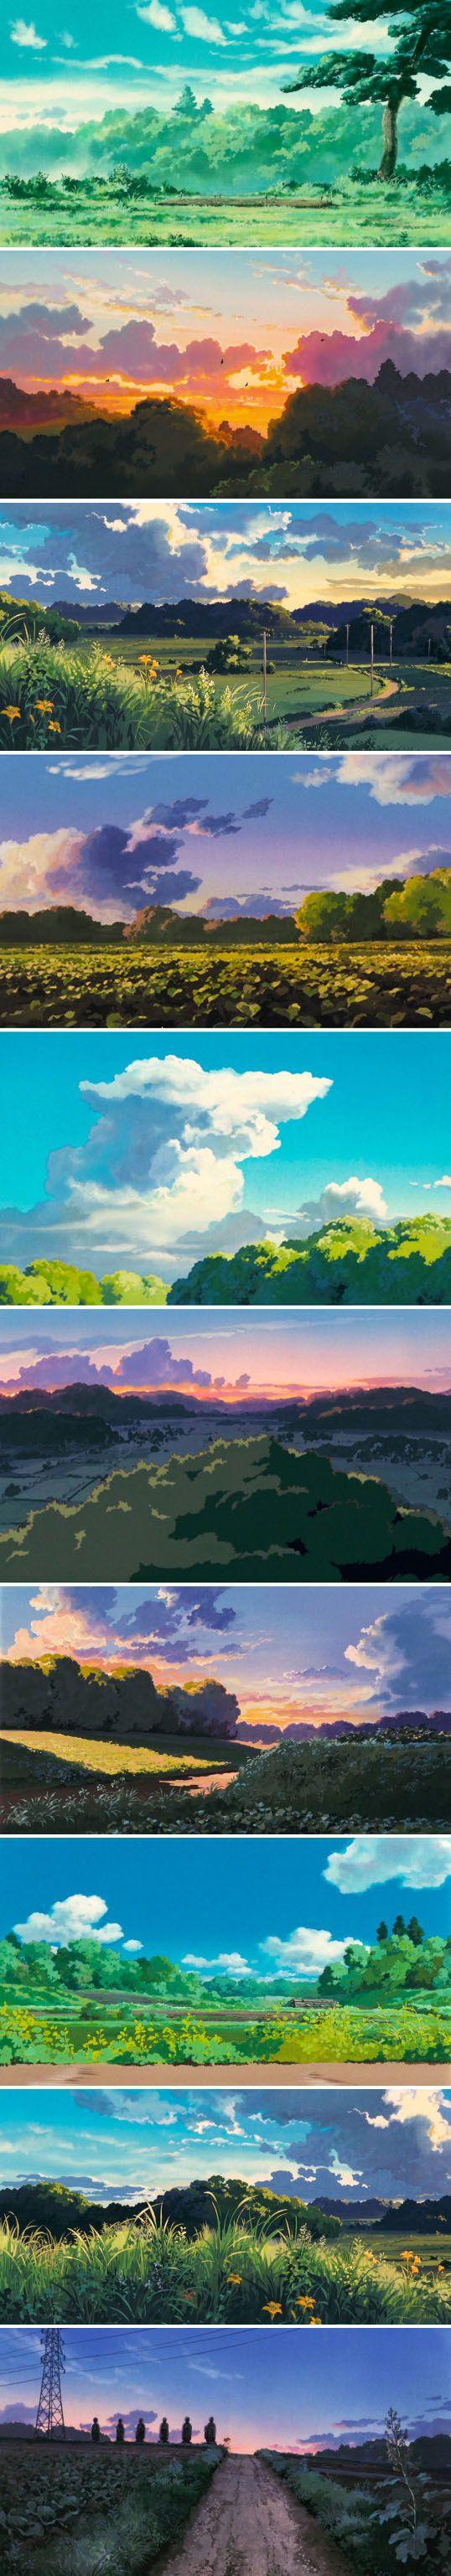 Cloud Strewn Skies Of My Neighbor Totoro - Art Director Kazuo Oga (1988)